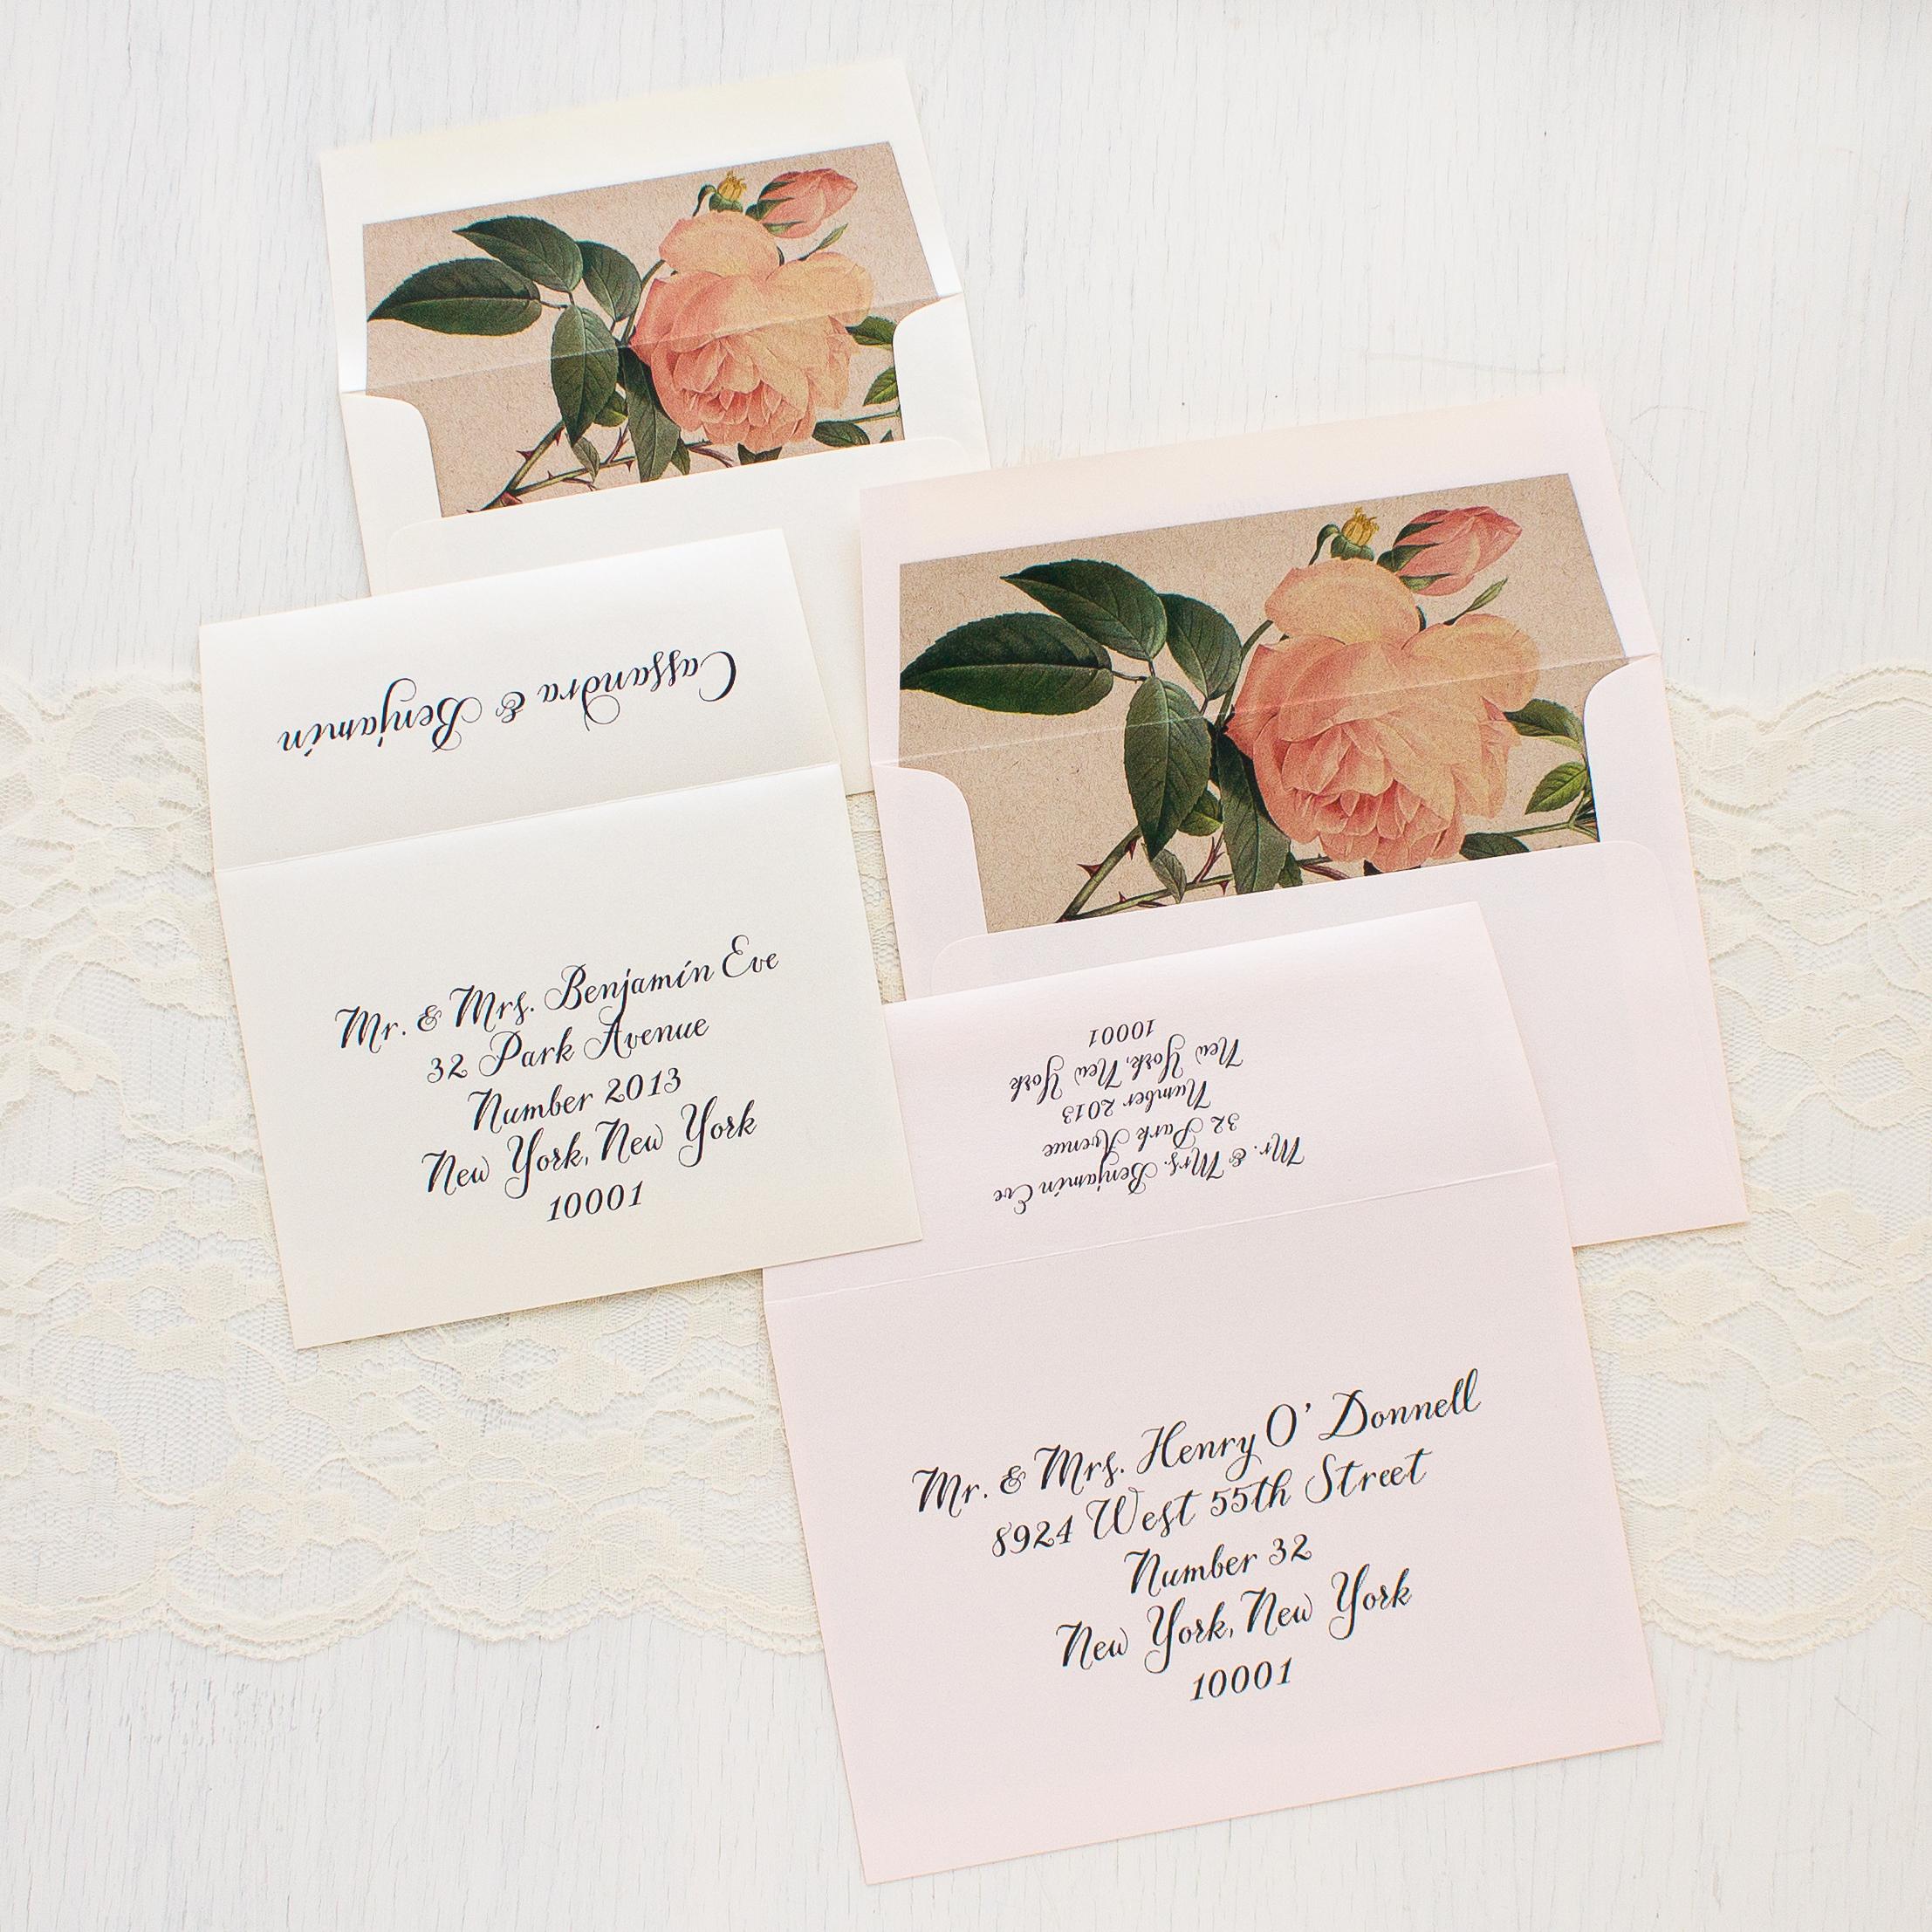 Ivory & Blush Floral Customizable Wedding Invitations | Beacon Lane